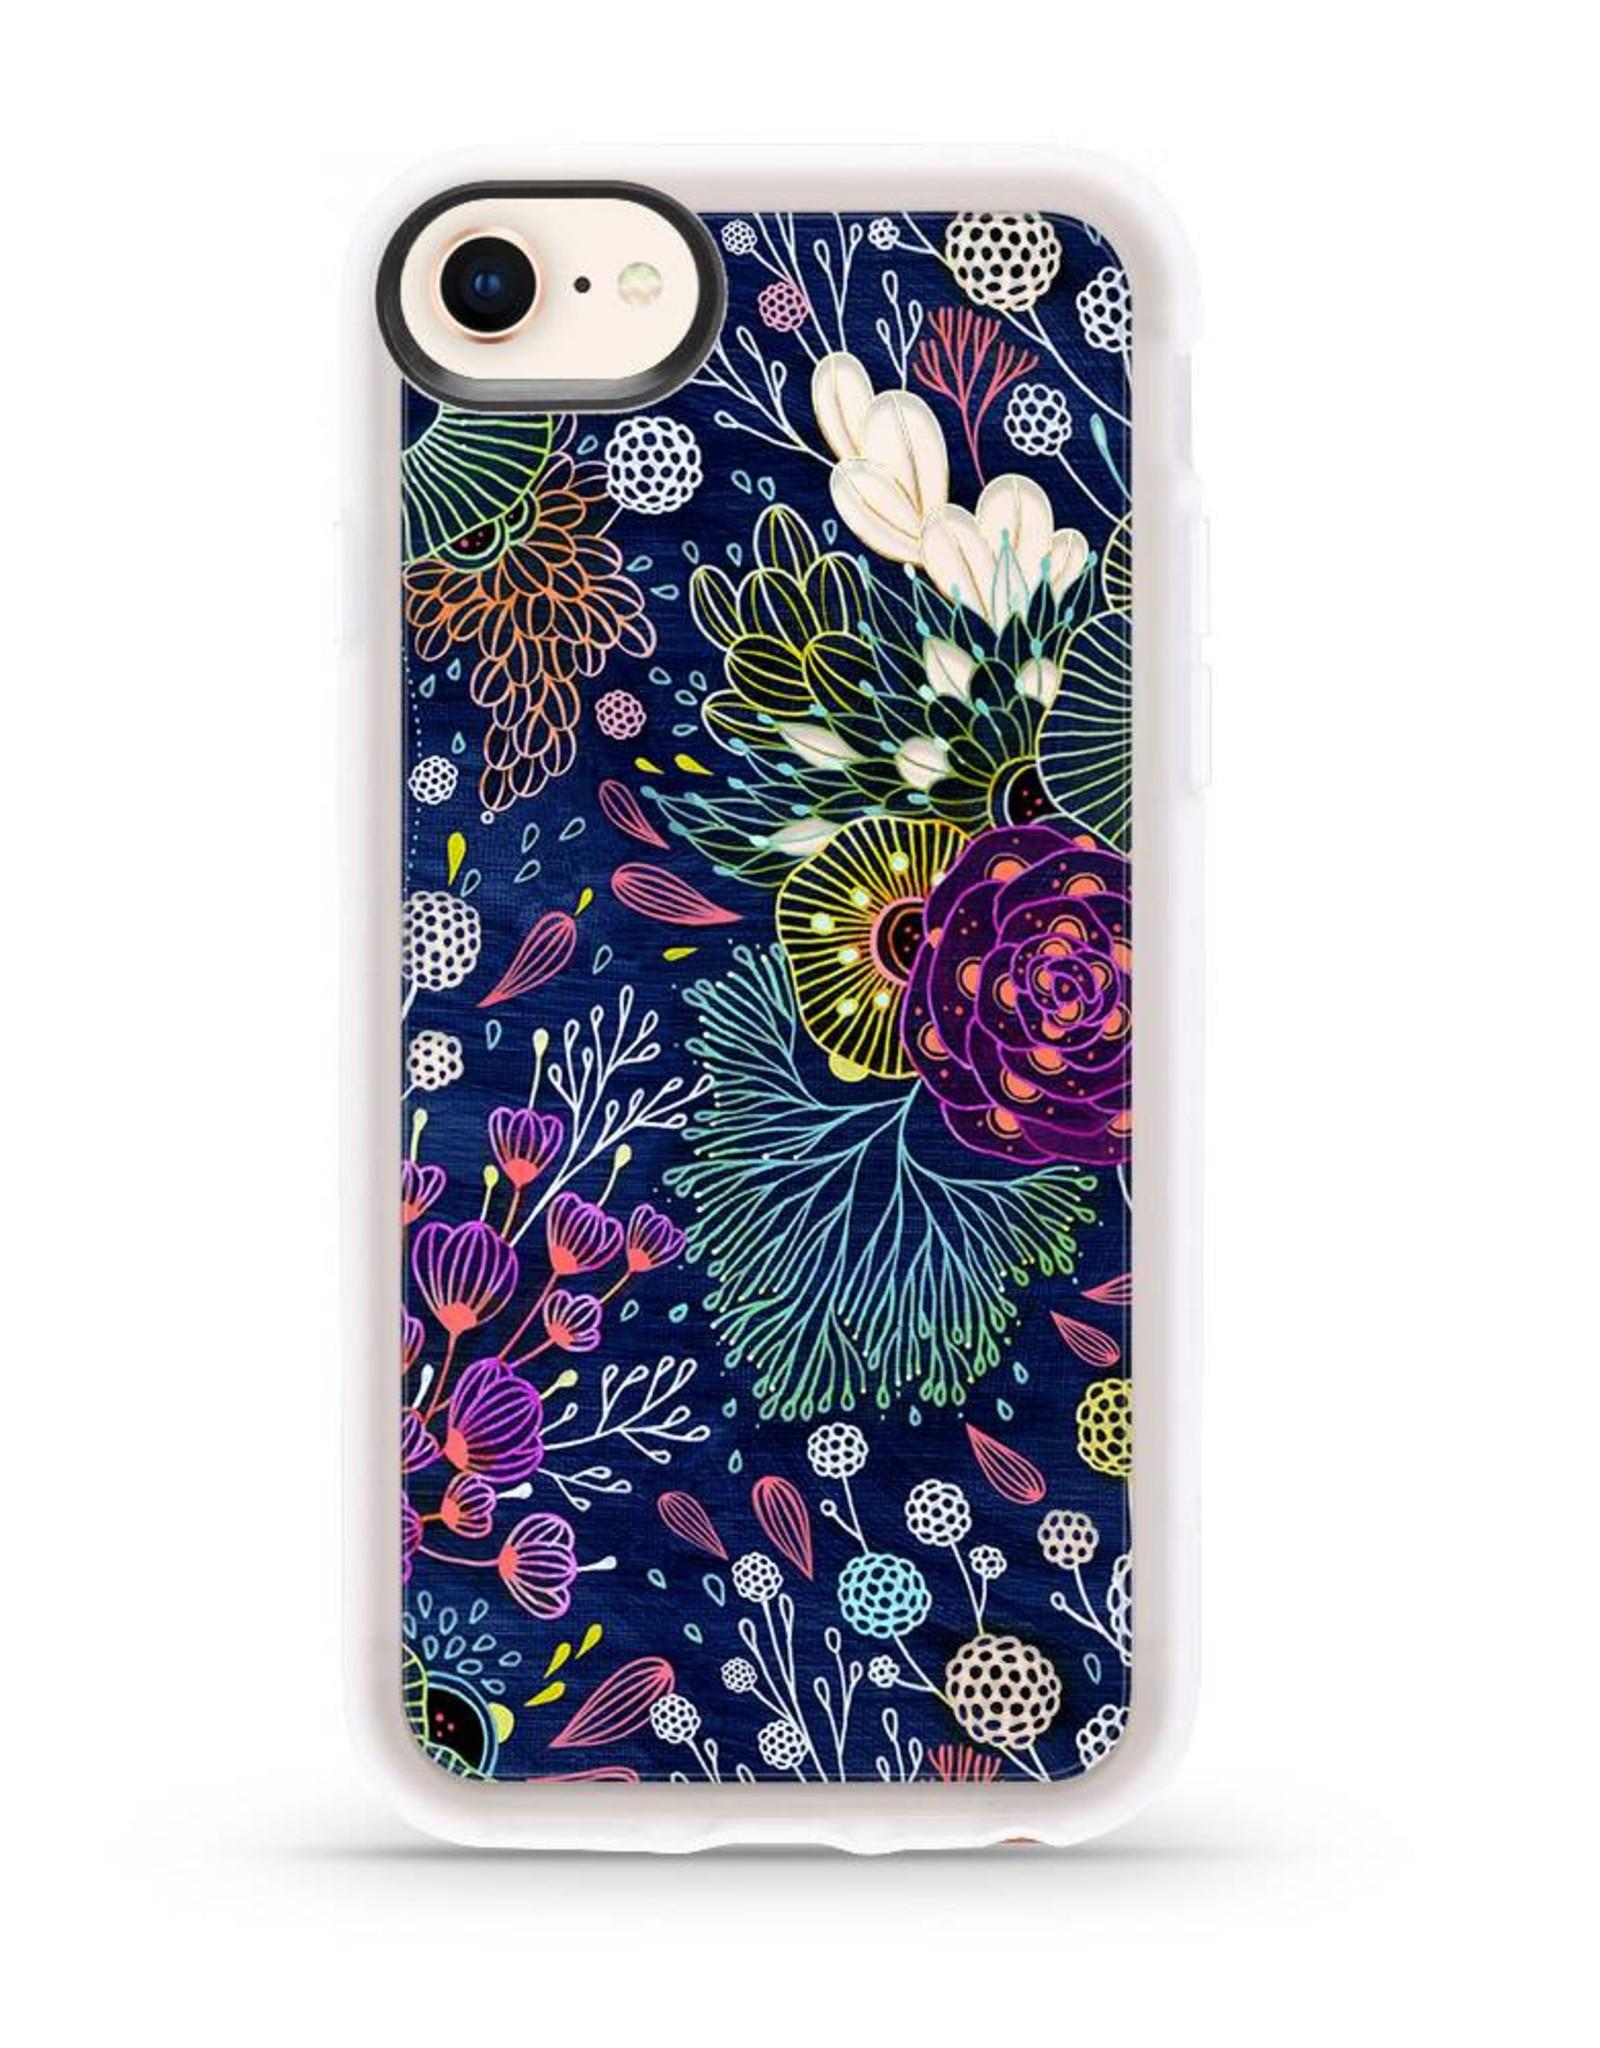 Casetify /// Casetify | iPhone 8/7/6/6s+ Grip Case Dark Floral | 120-0932